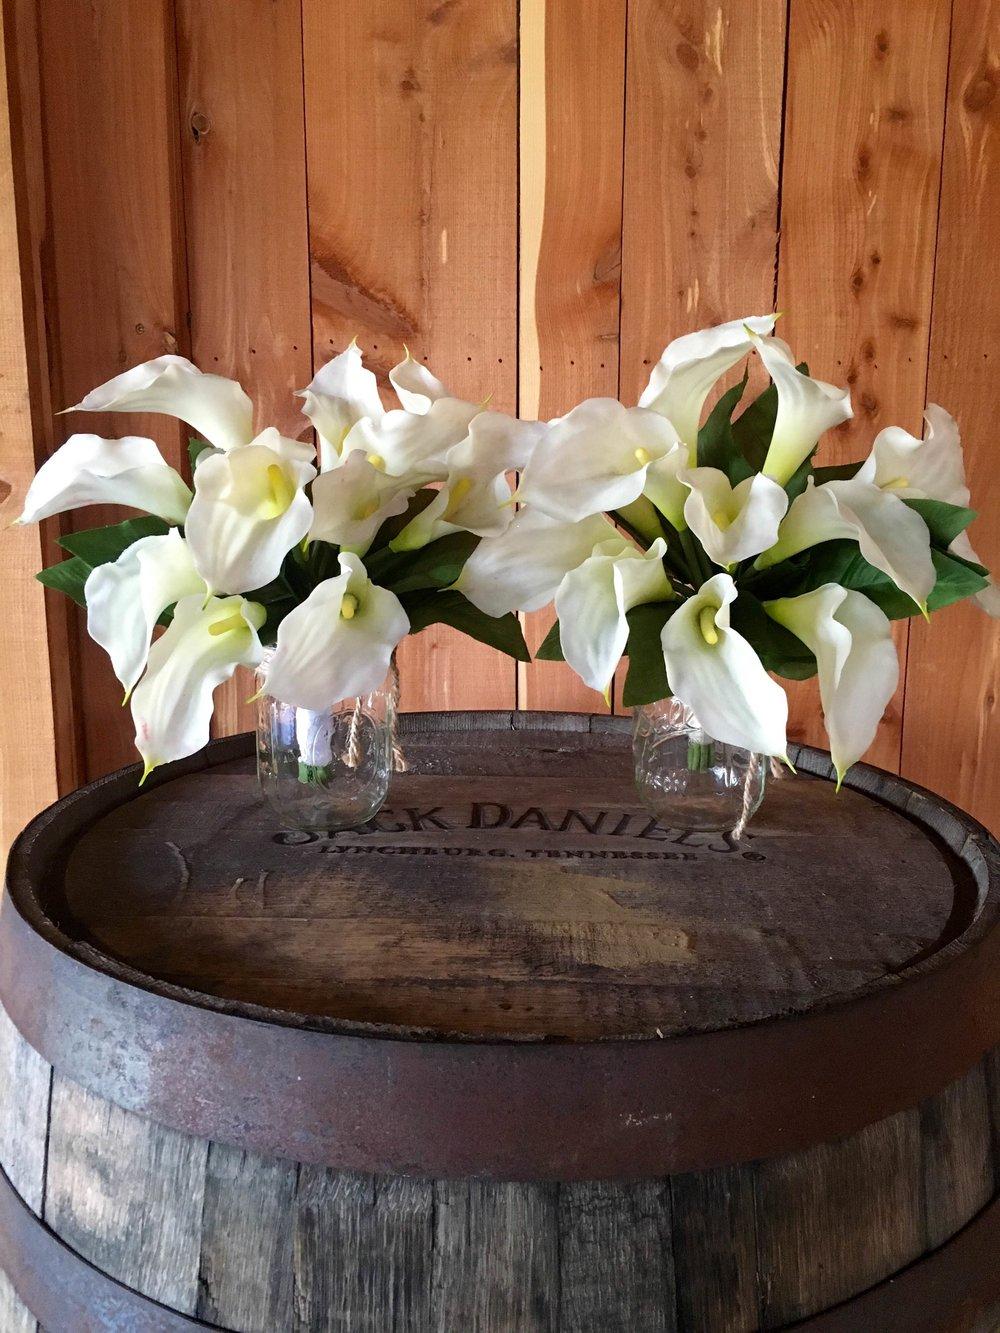 #180 - Lilies